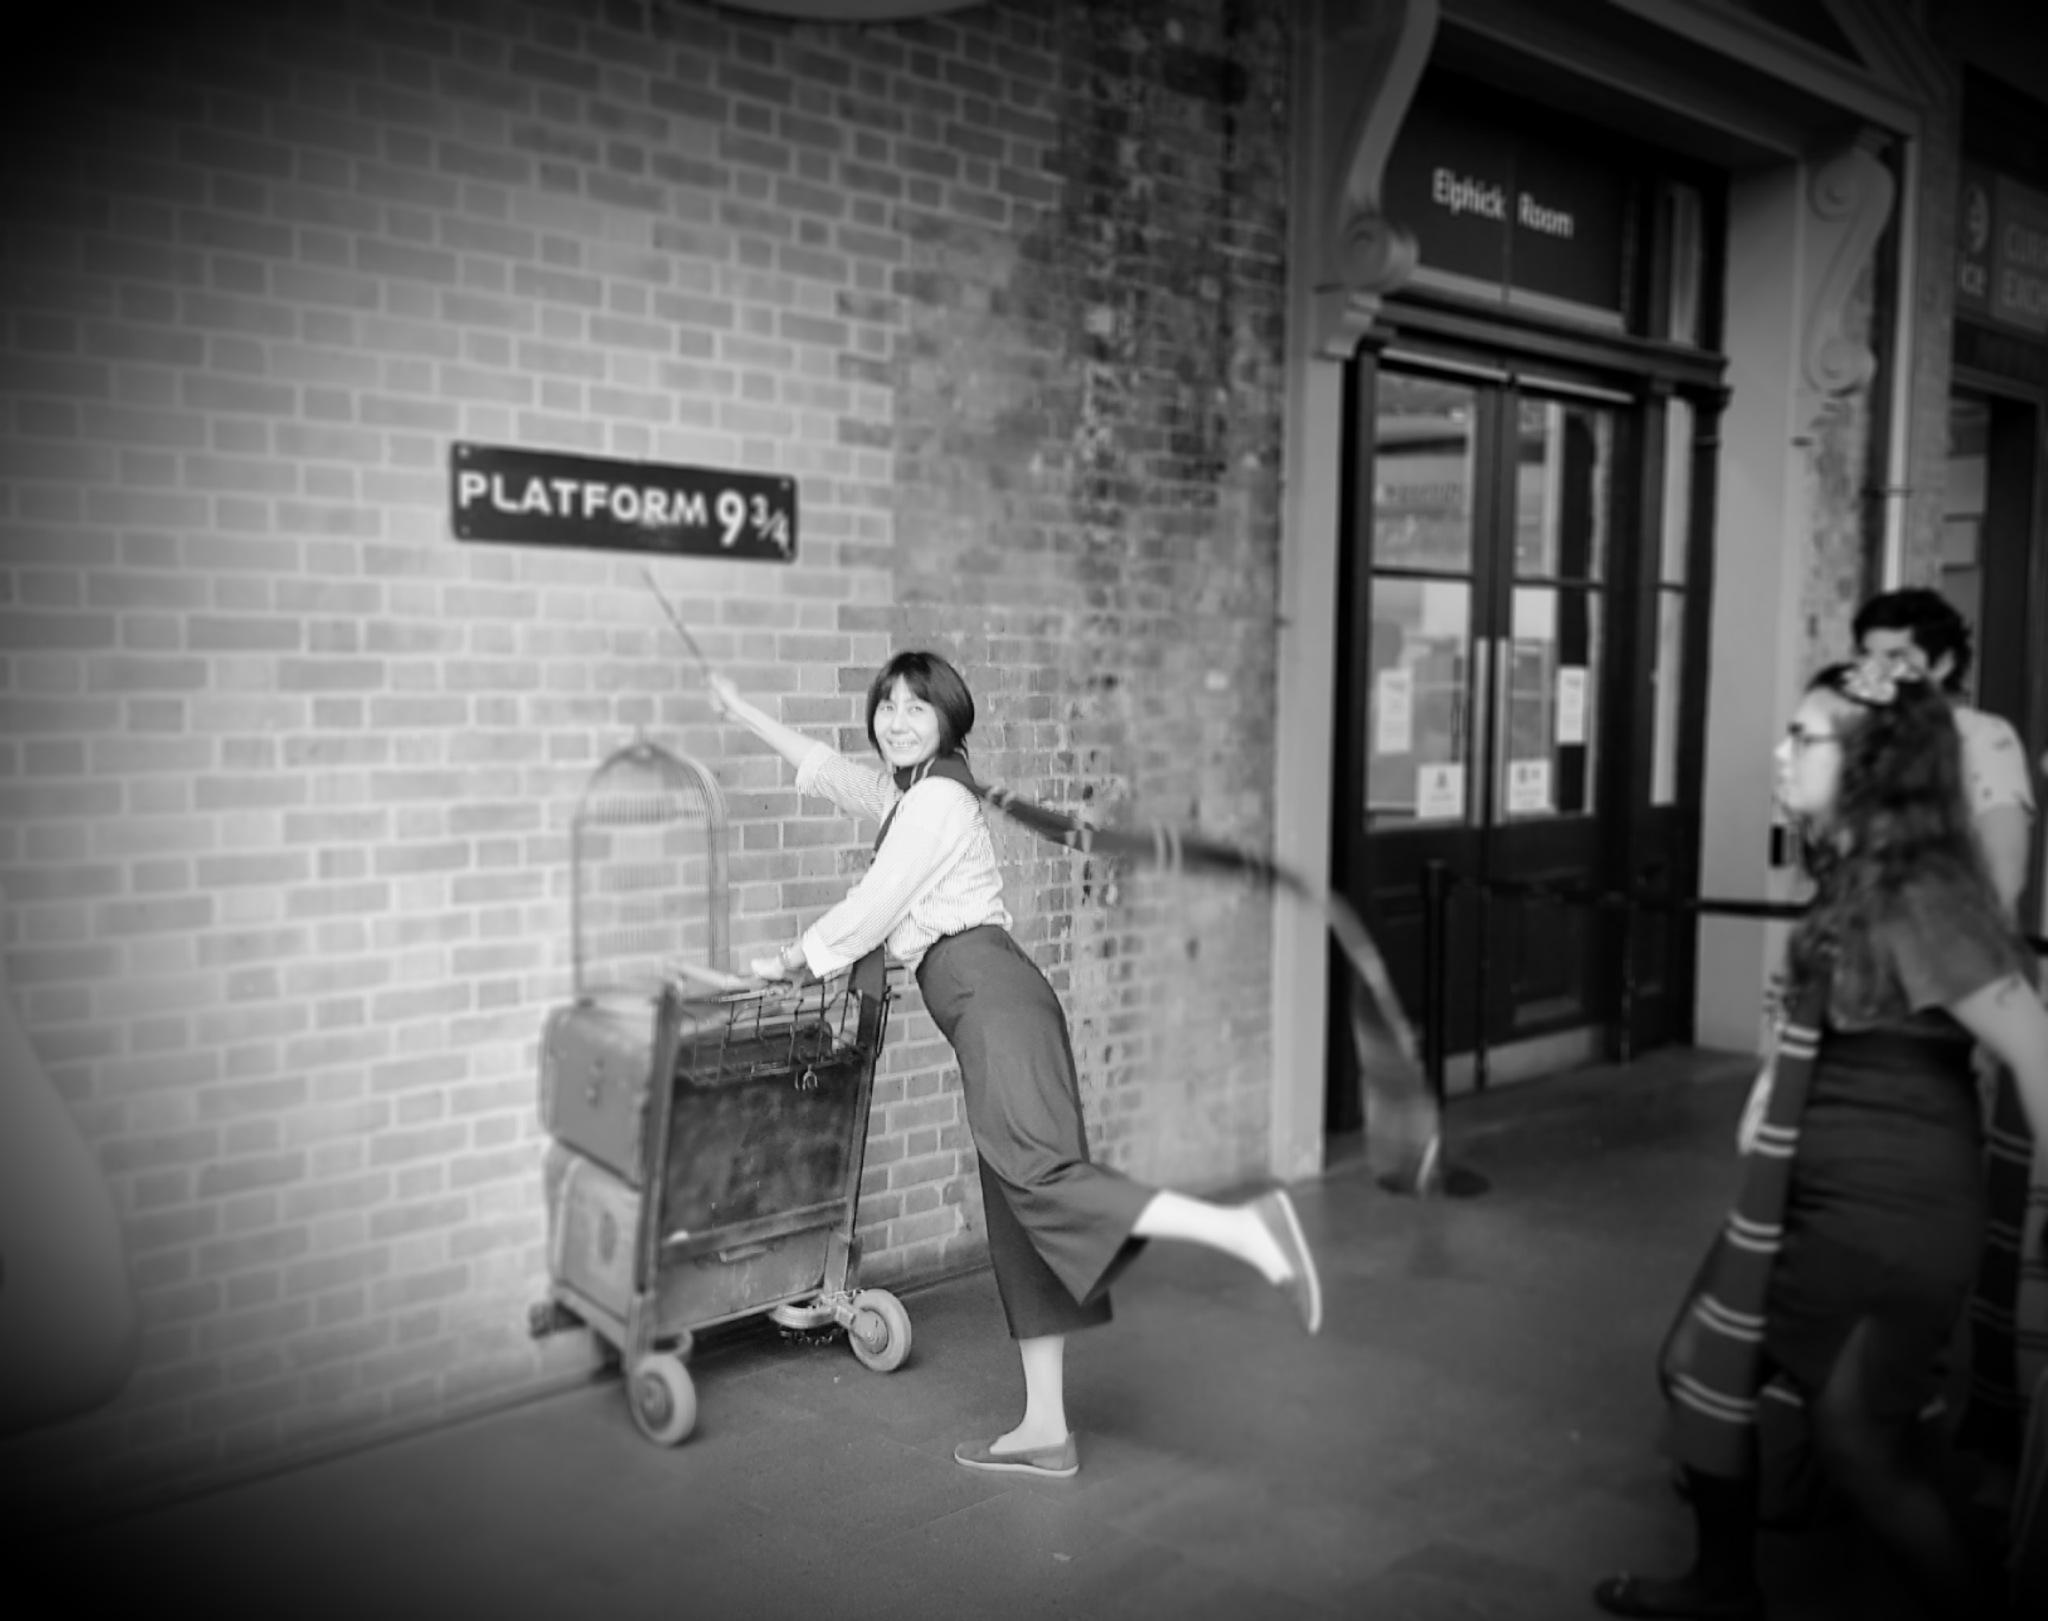 King's Cross station... by John Jack Dubajka